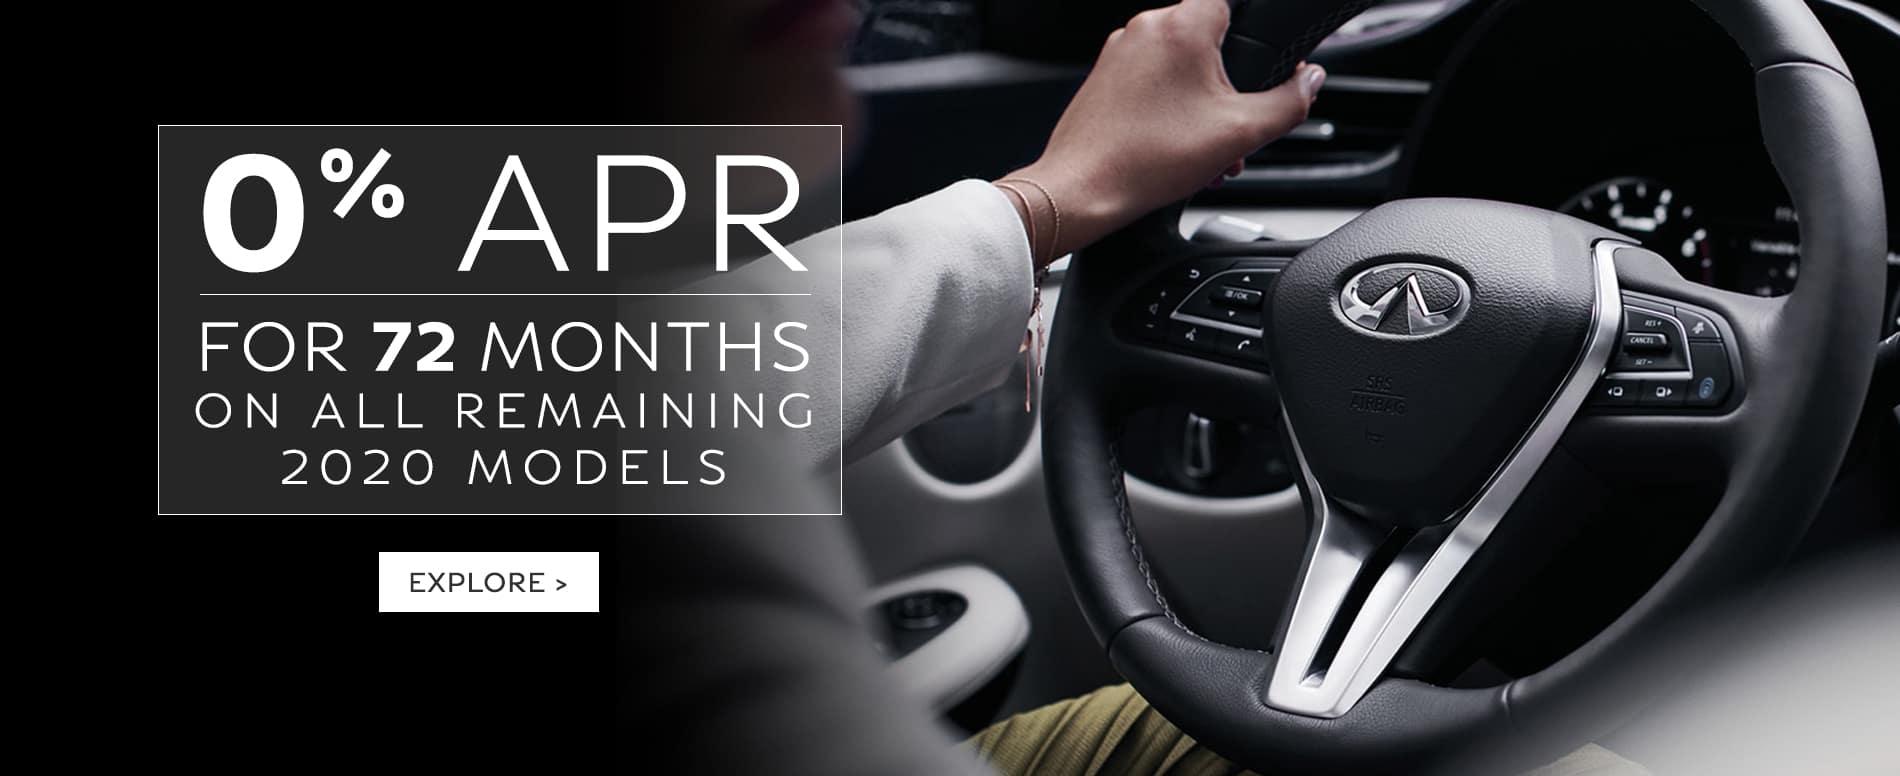 Enjoy 0% APR for 72 months on remaining 2020 Models.